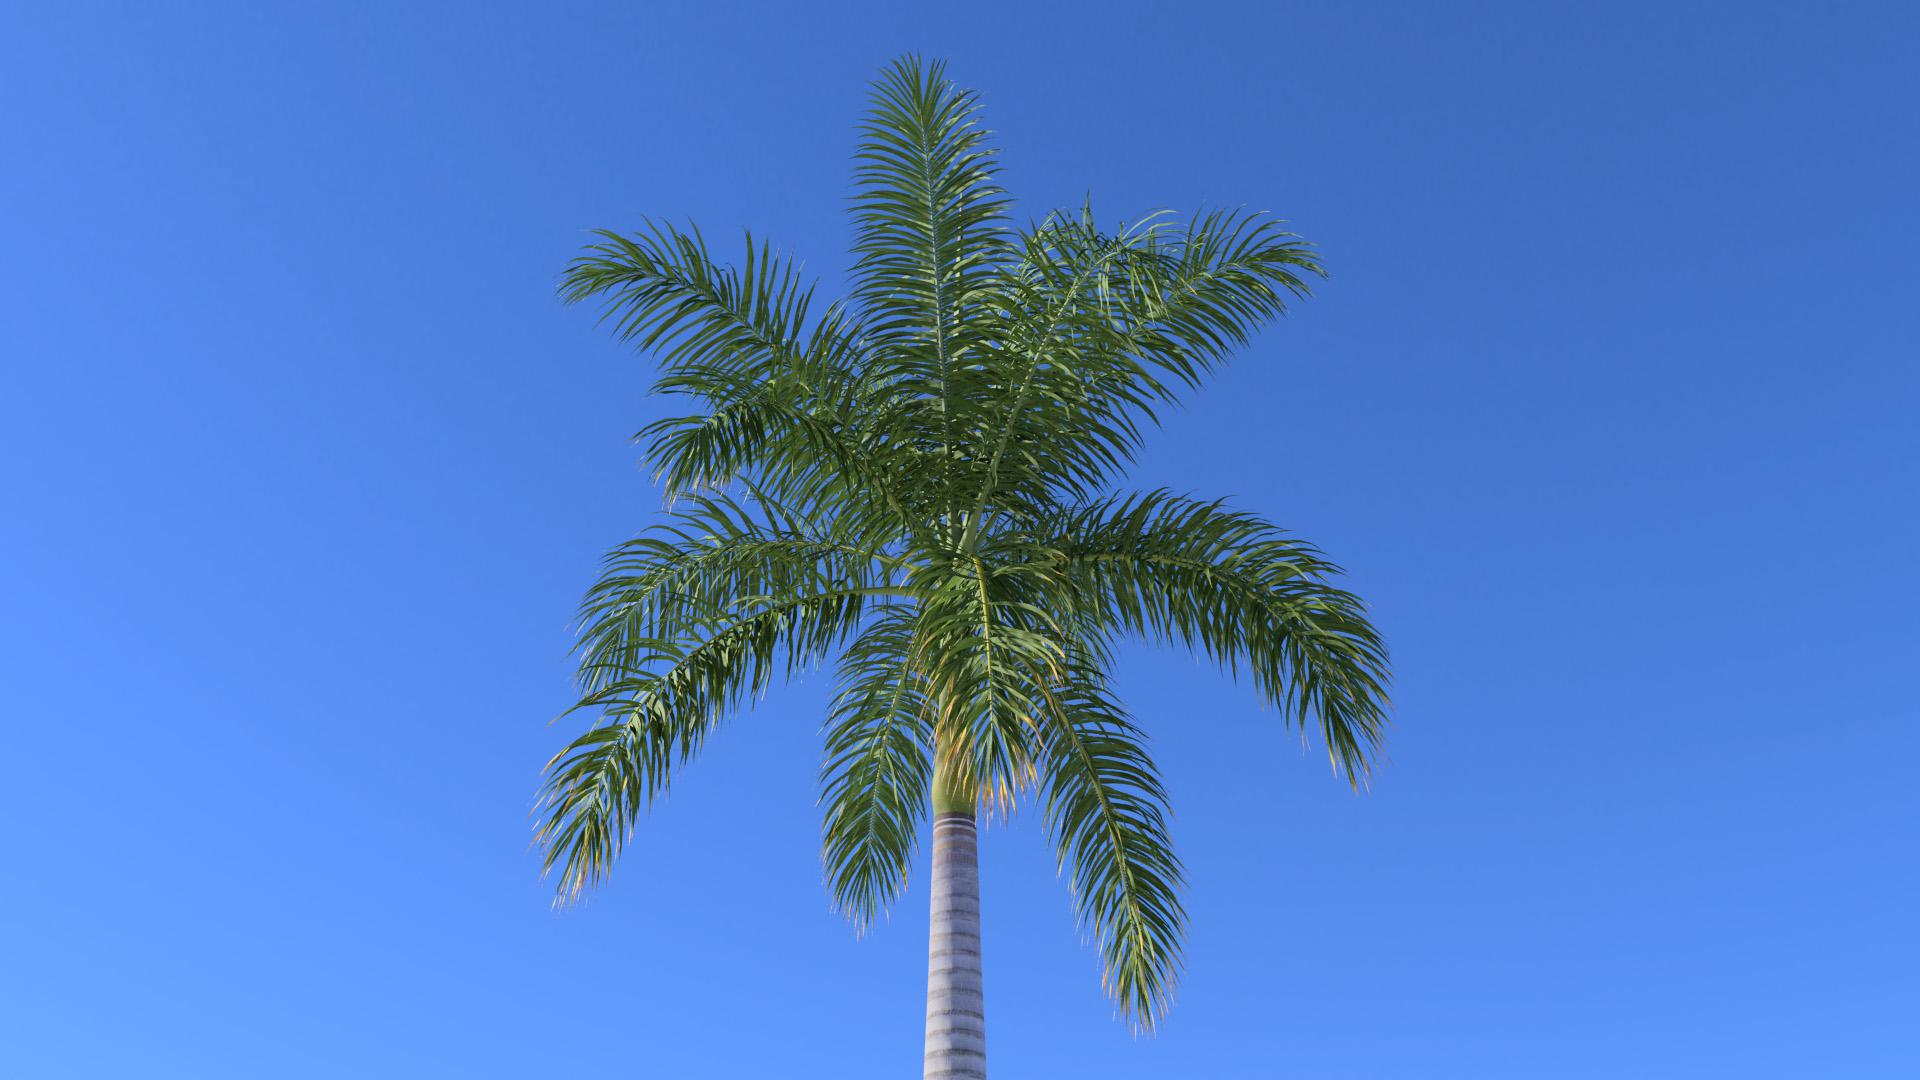 3D model of the Royal palm Roystonea regia close-up